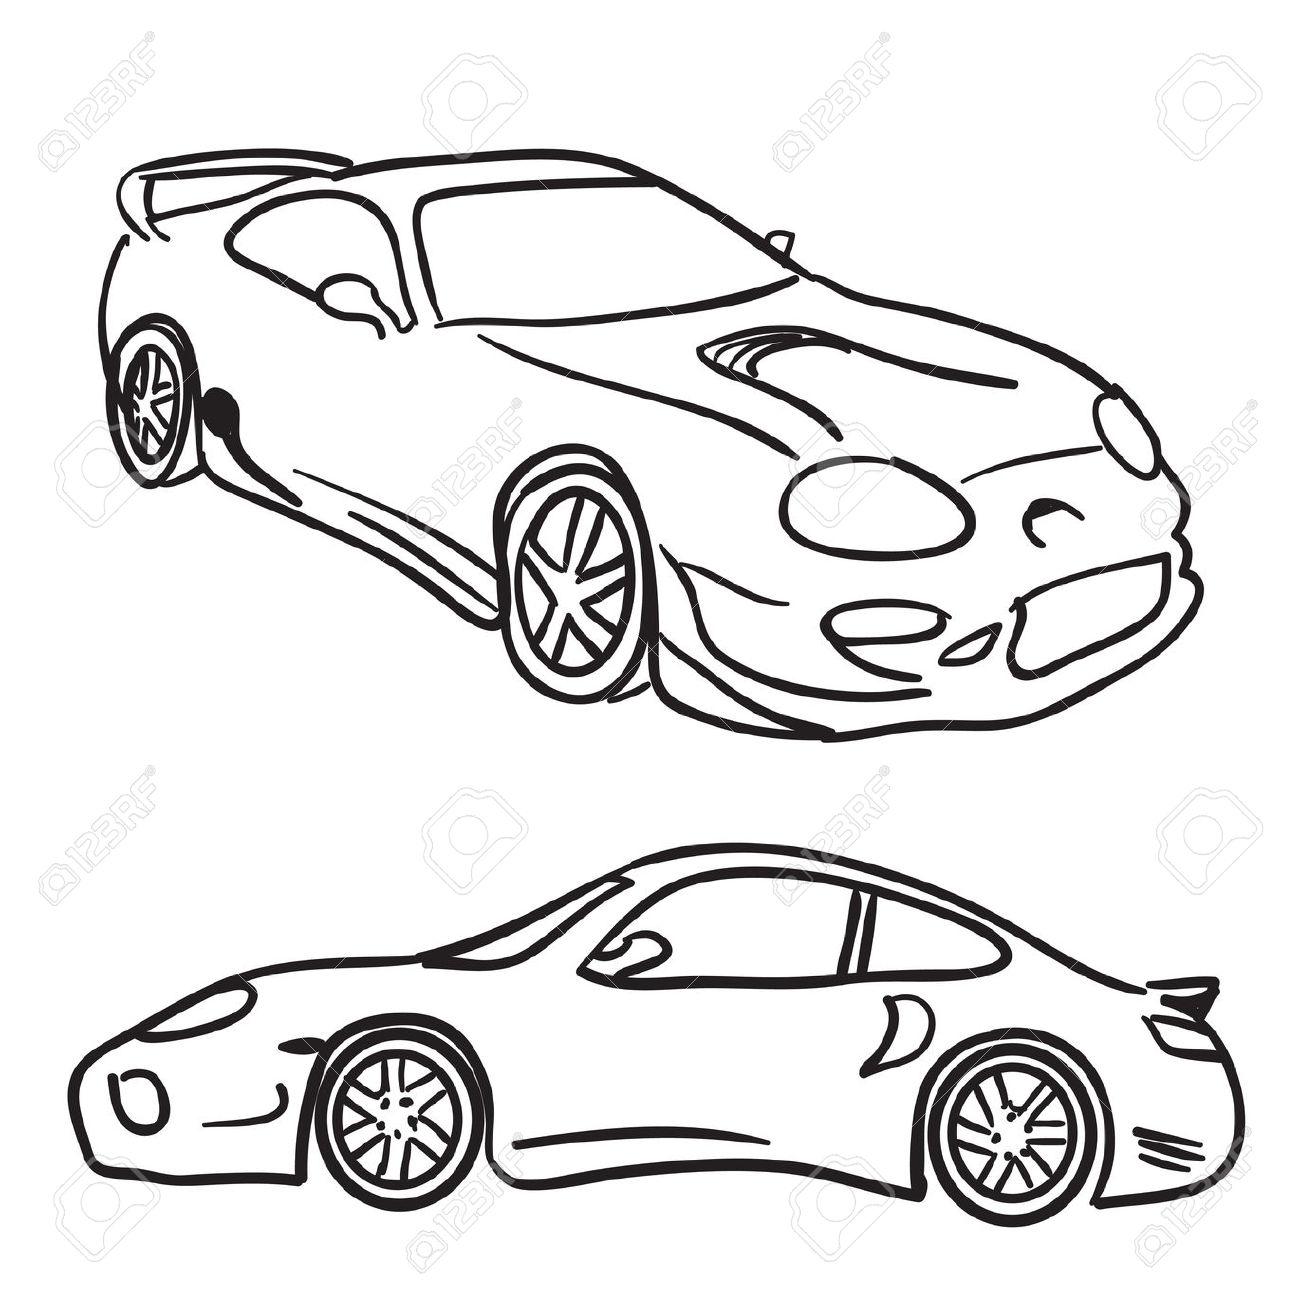 Stock photos car clipart clip art freeuse download Stock car clipart outline - ClipartFest clip art freeuse download